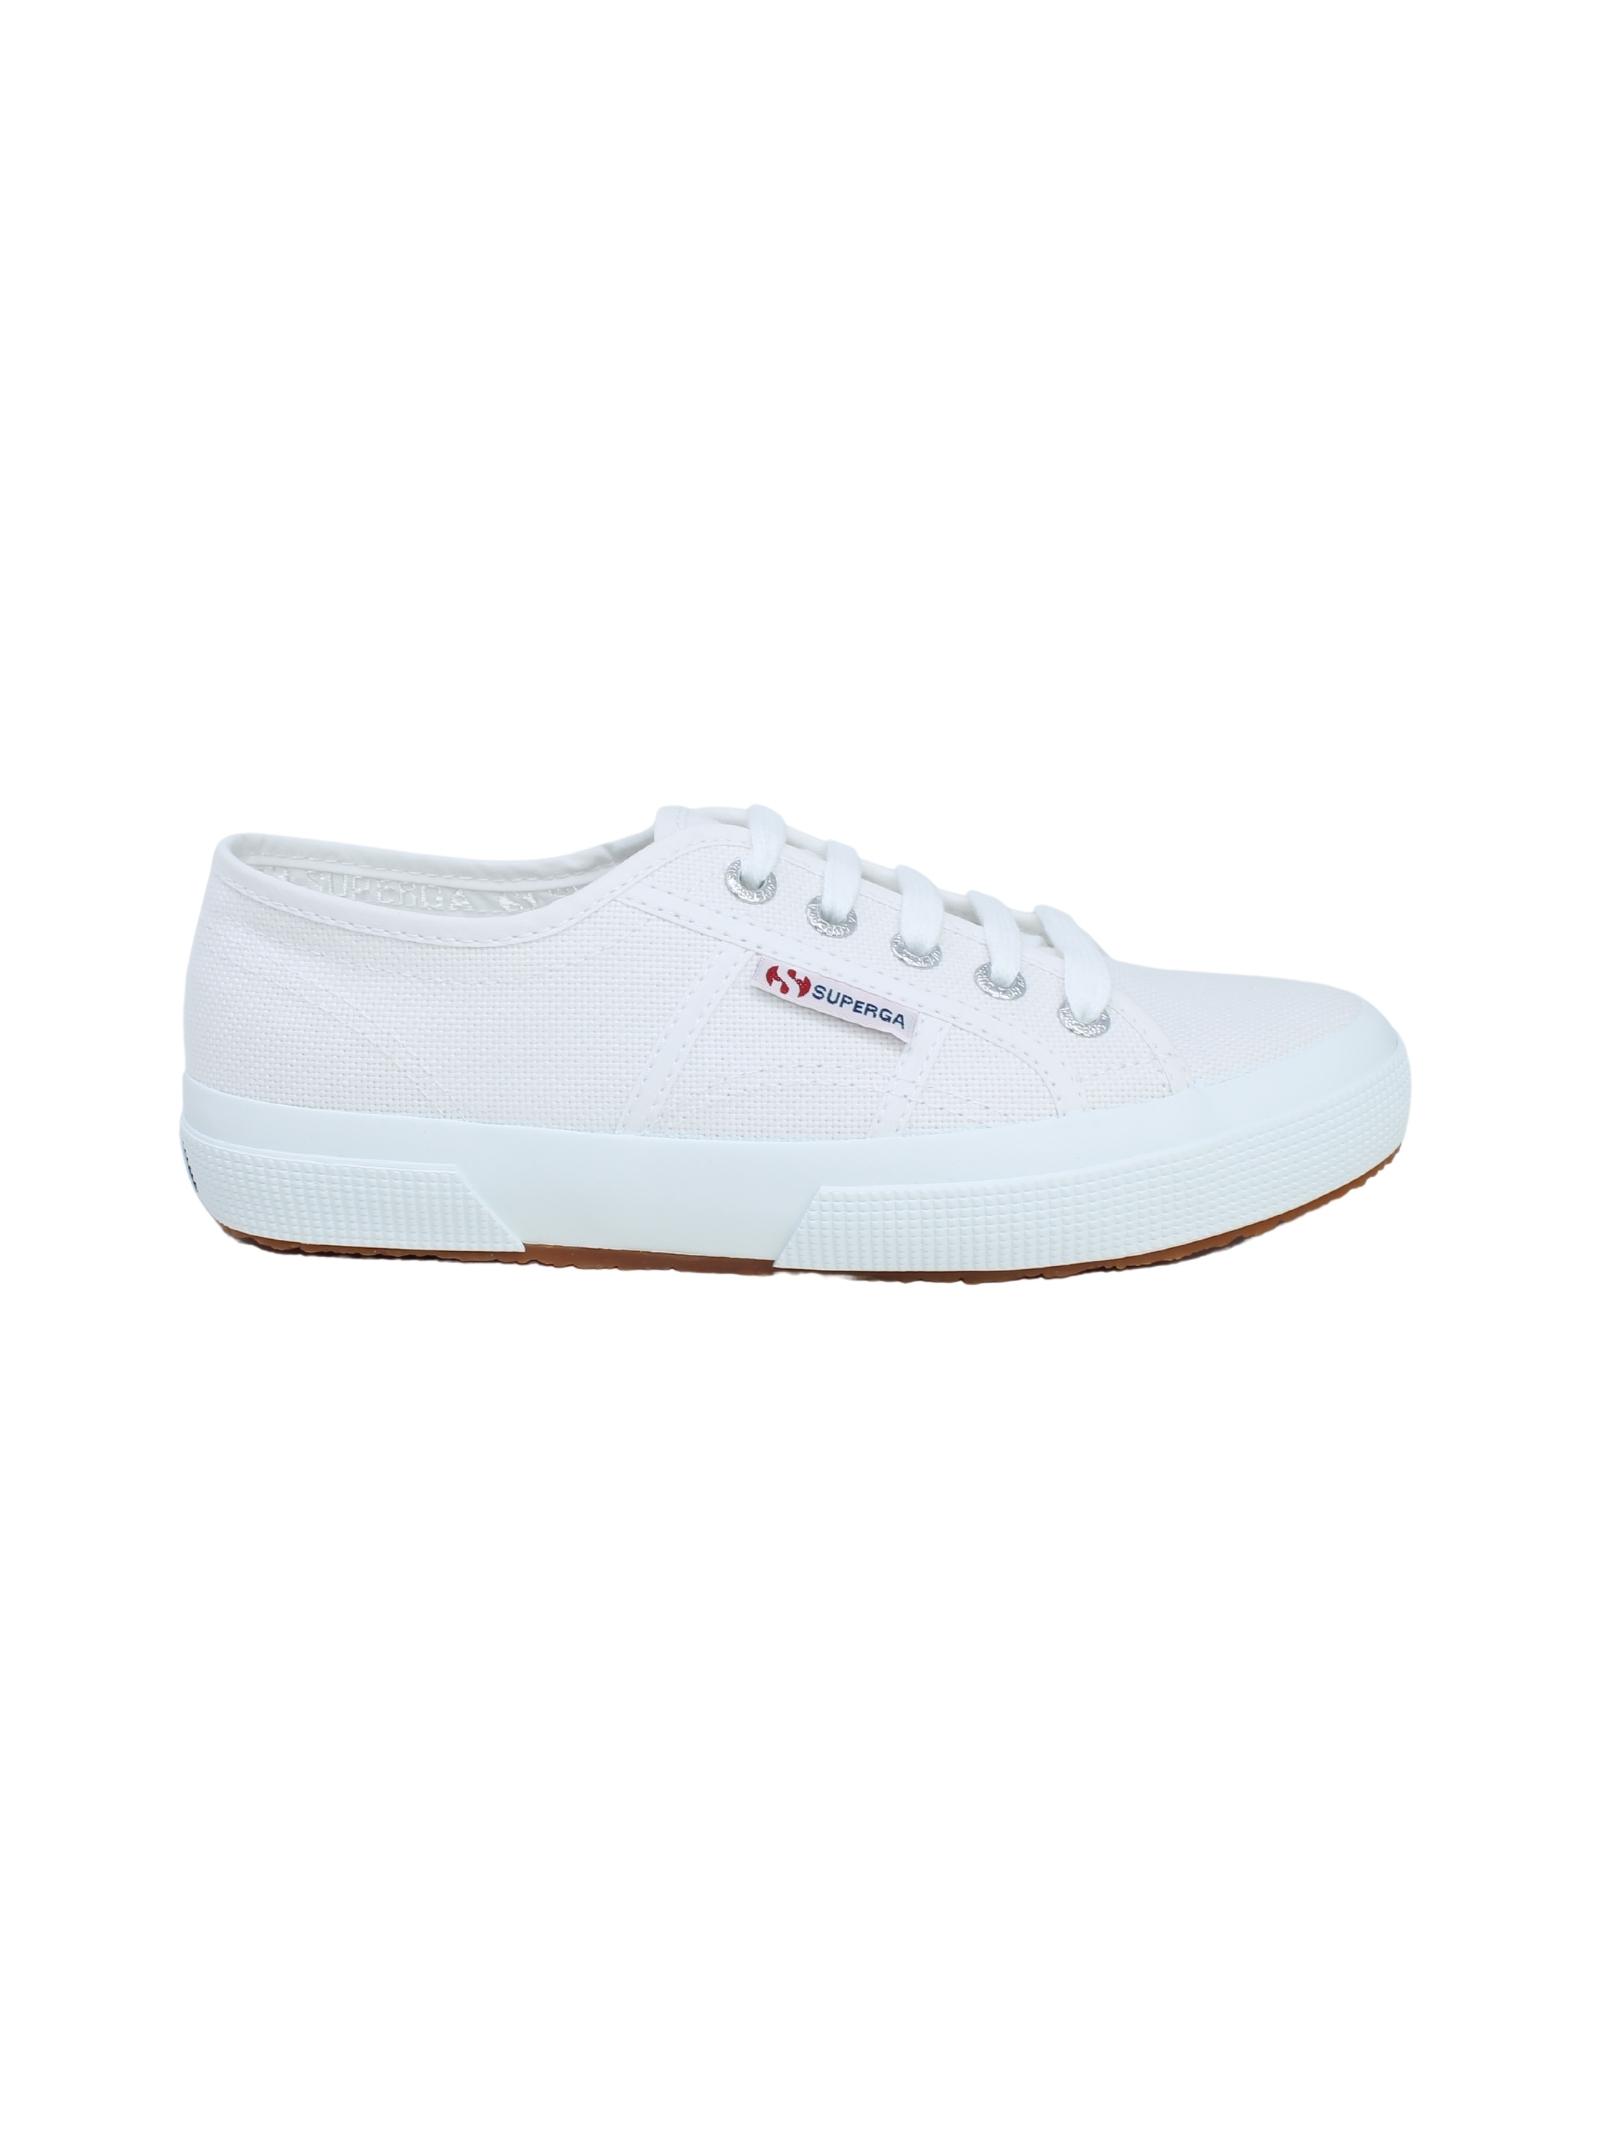 SUPERGA KIDS | Sneakers | 2750S000010901